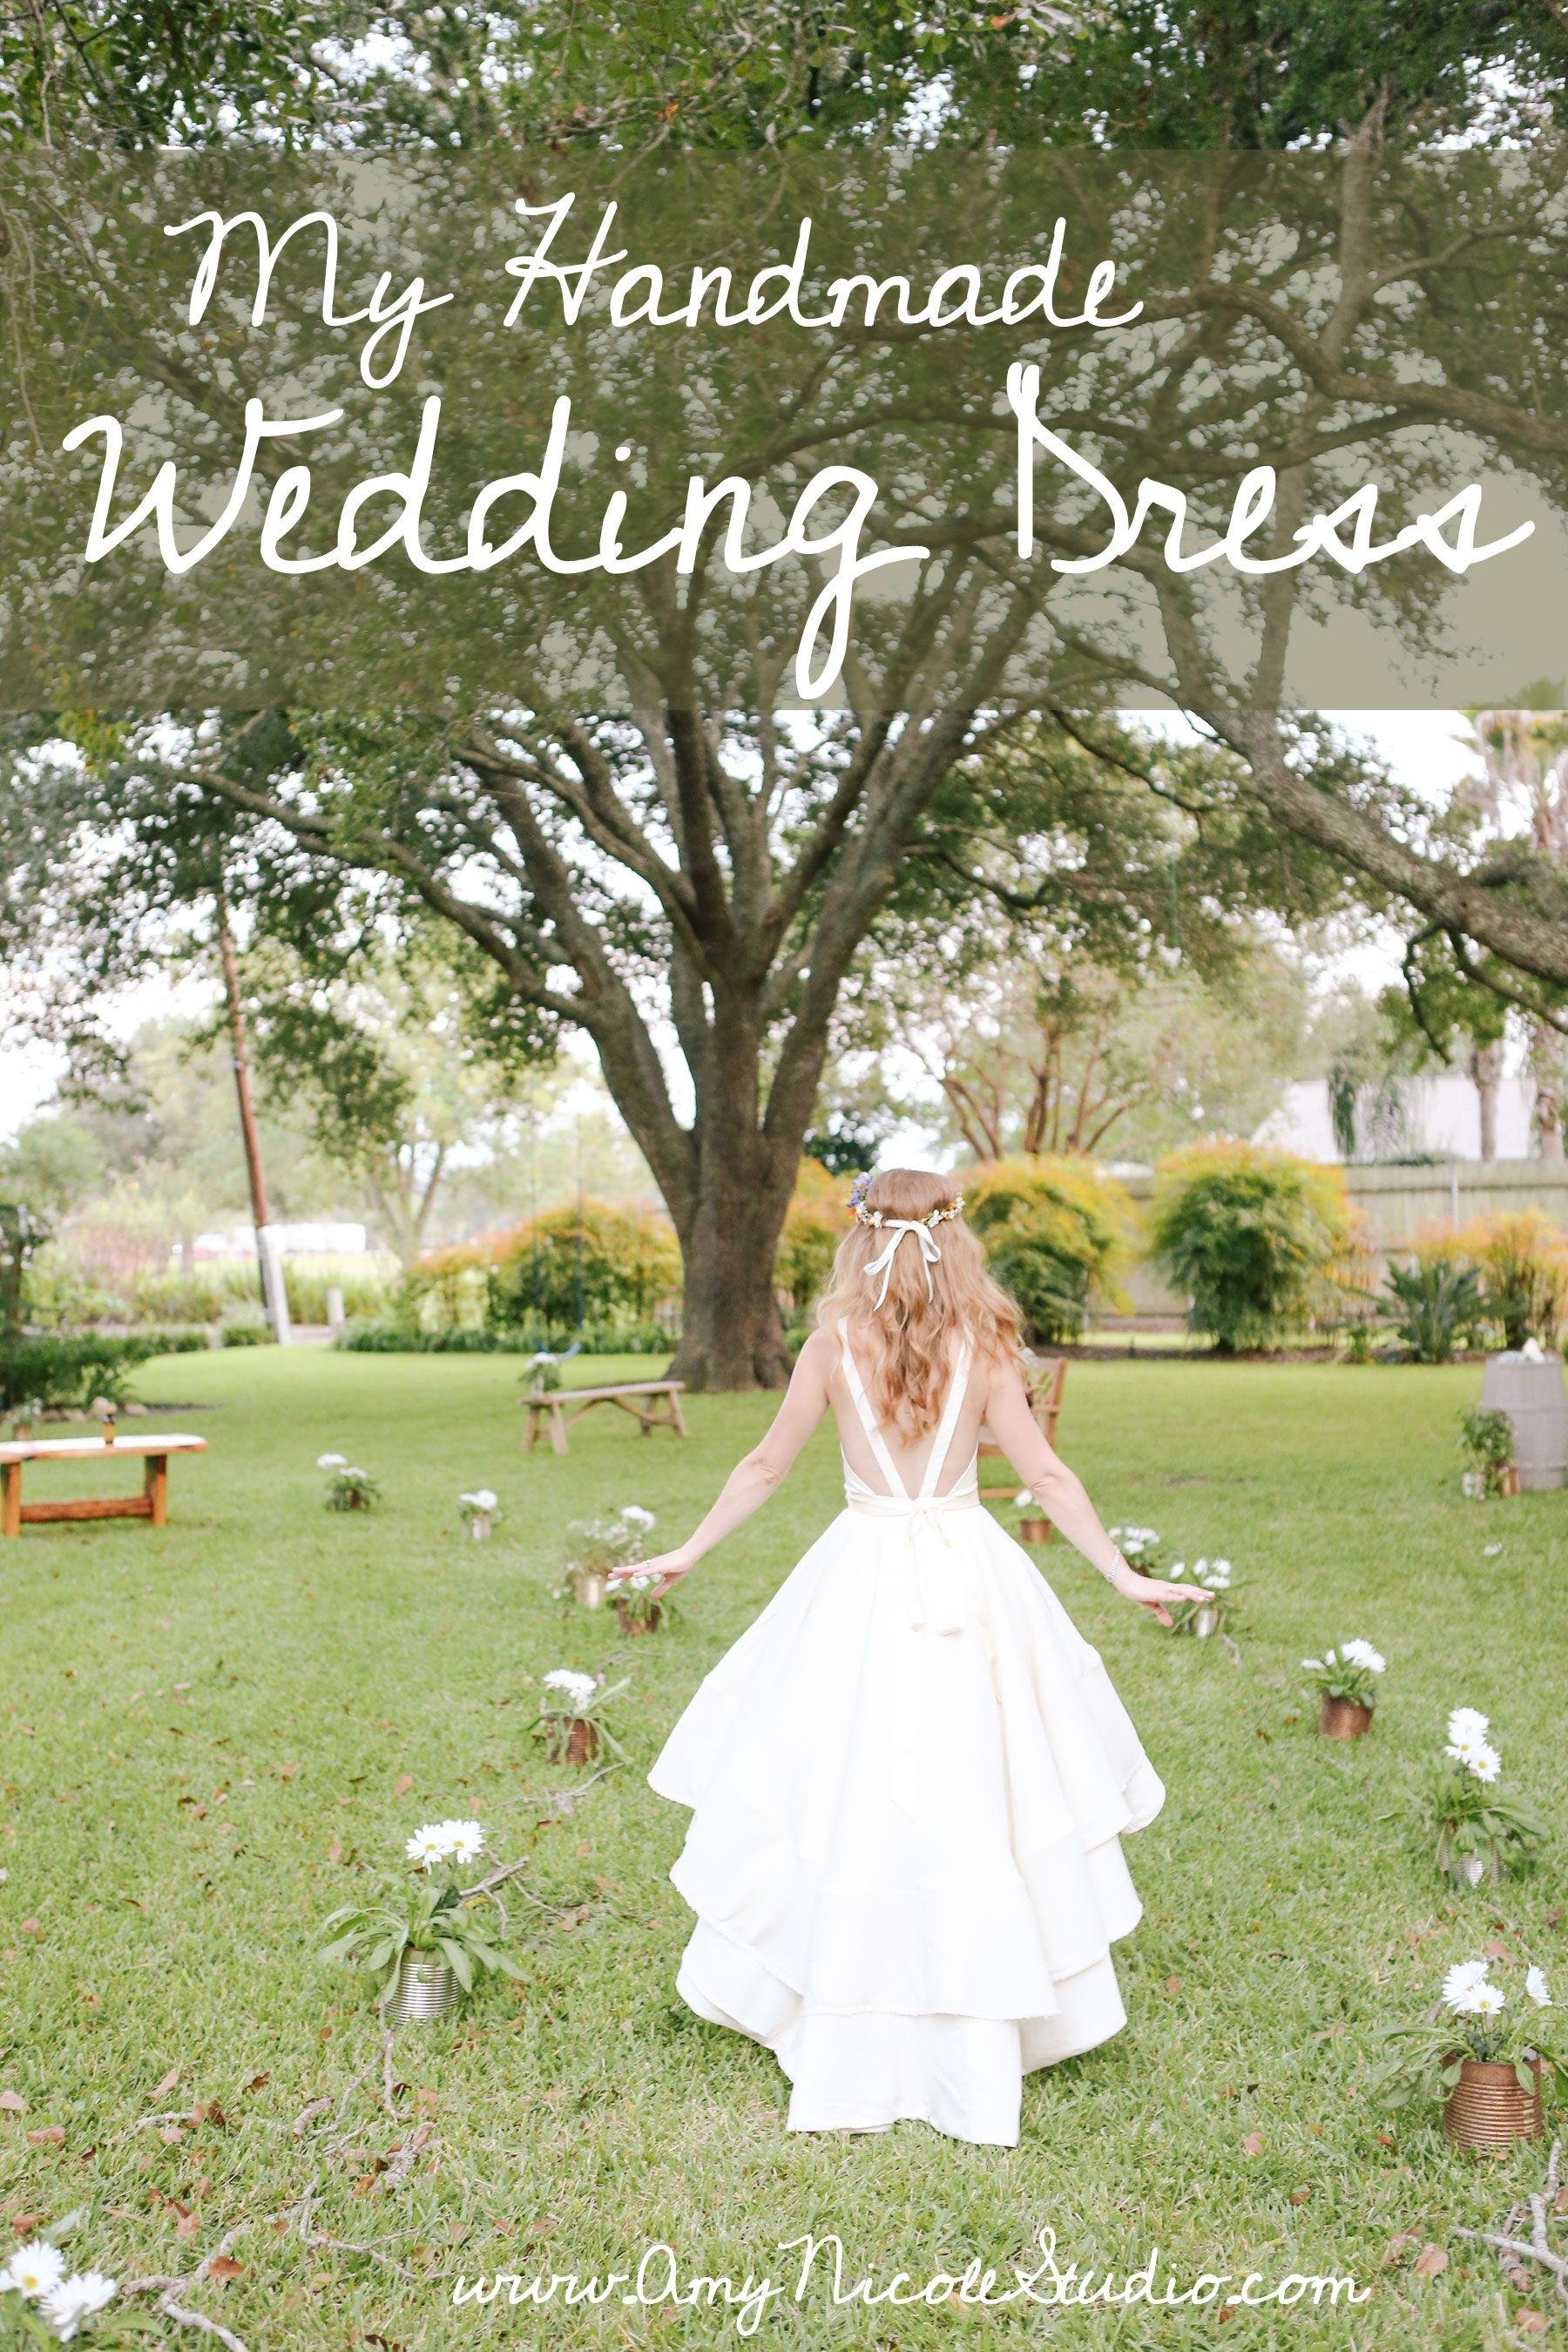 Amy Nicole Studio A Handmade Wedding Dress My Perfect Wedding - Homemade Wedding Dress